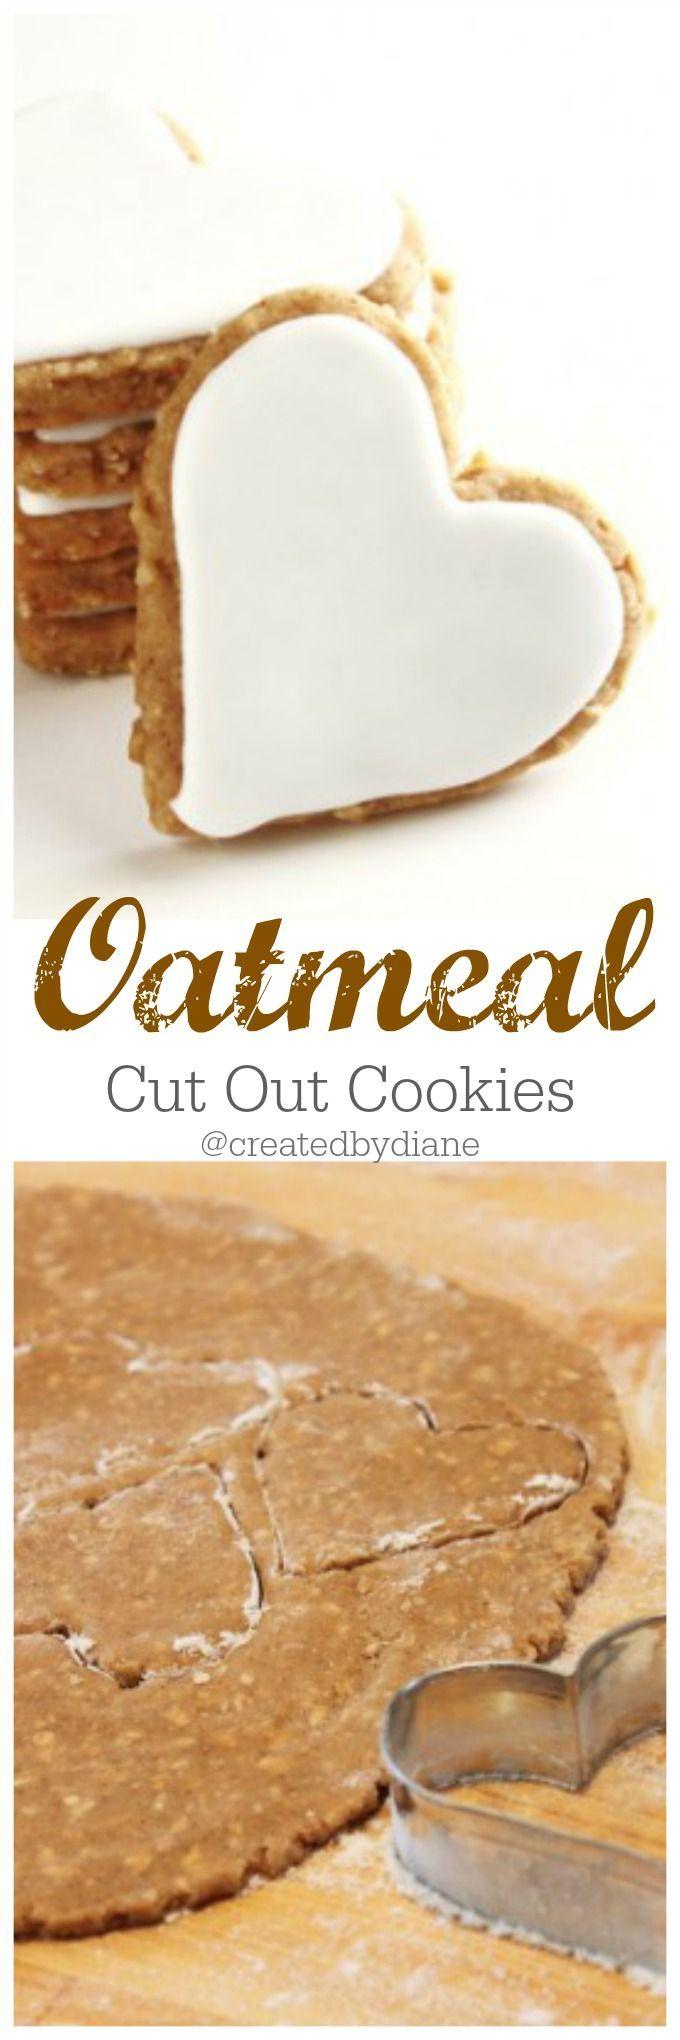 oatmeal cut out cookies /createdbydiane/ http://www.createdby-diane.com